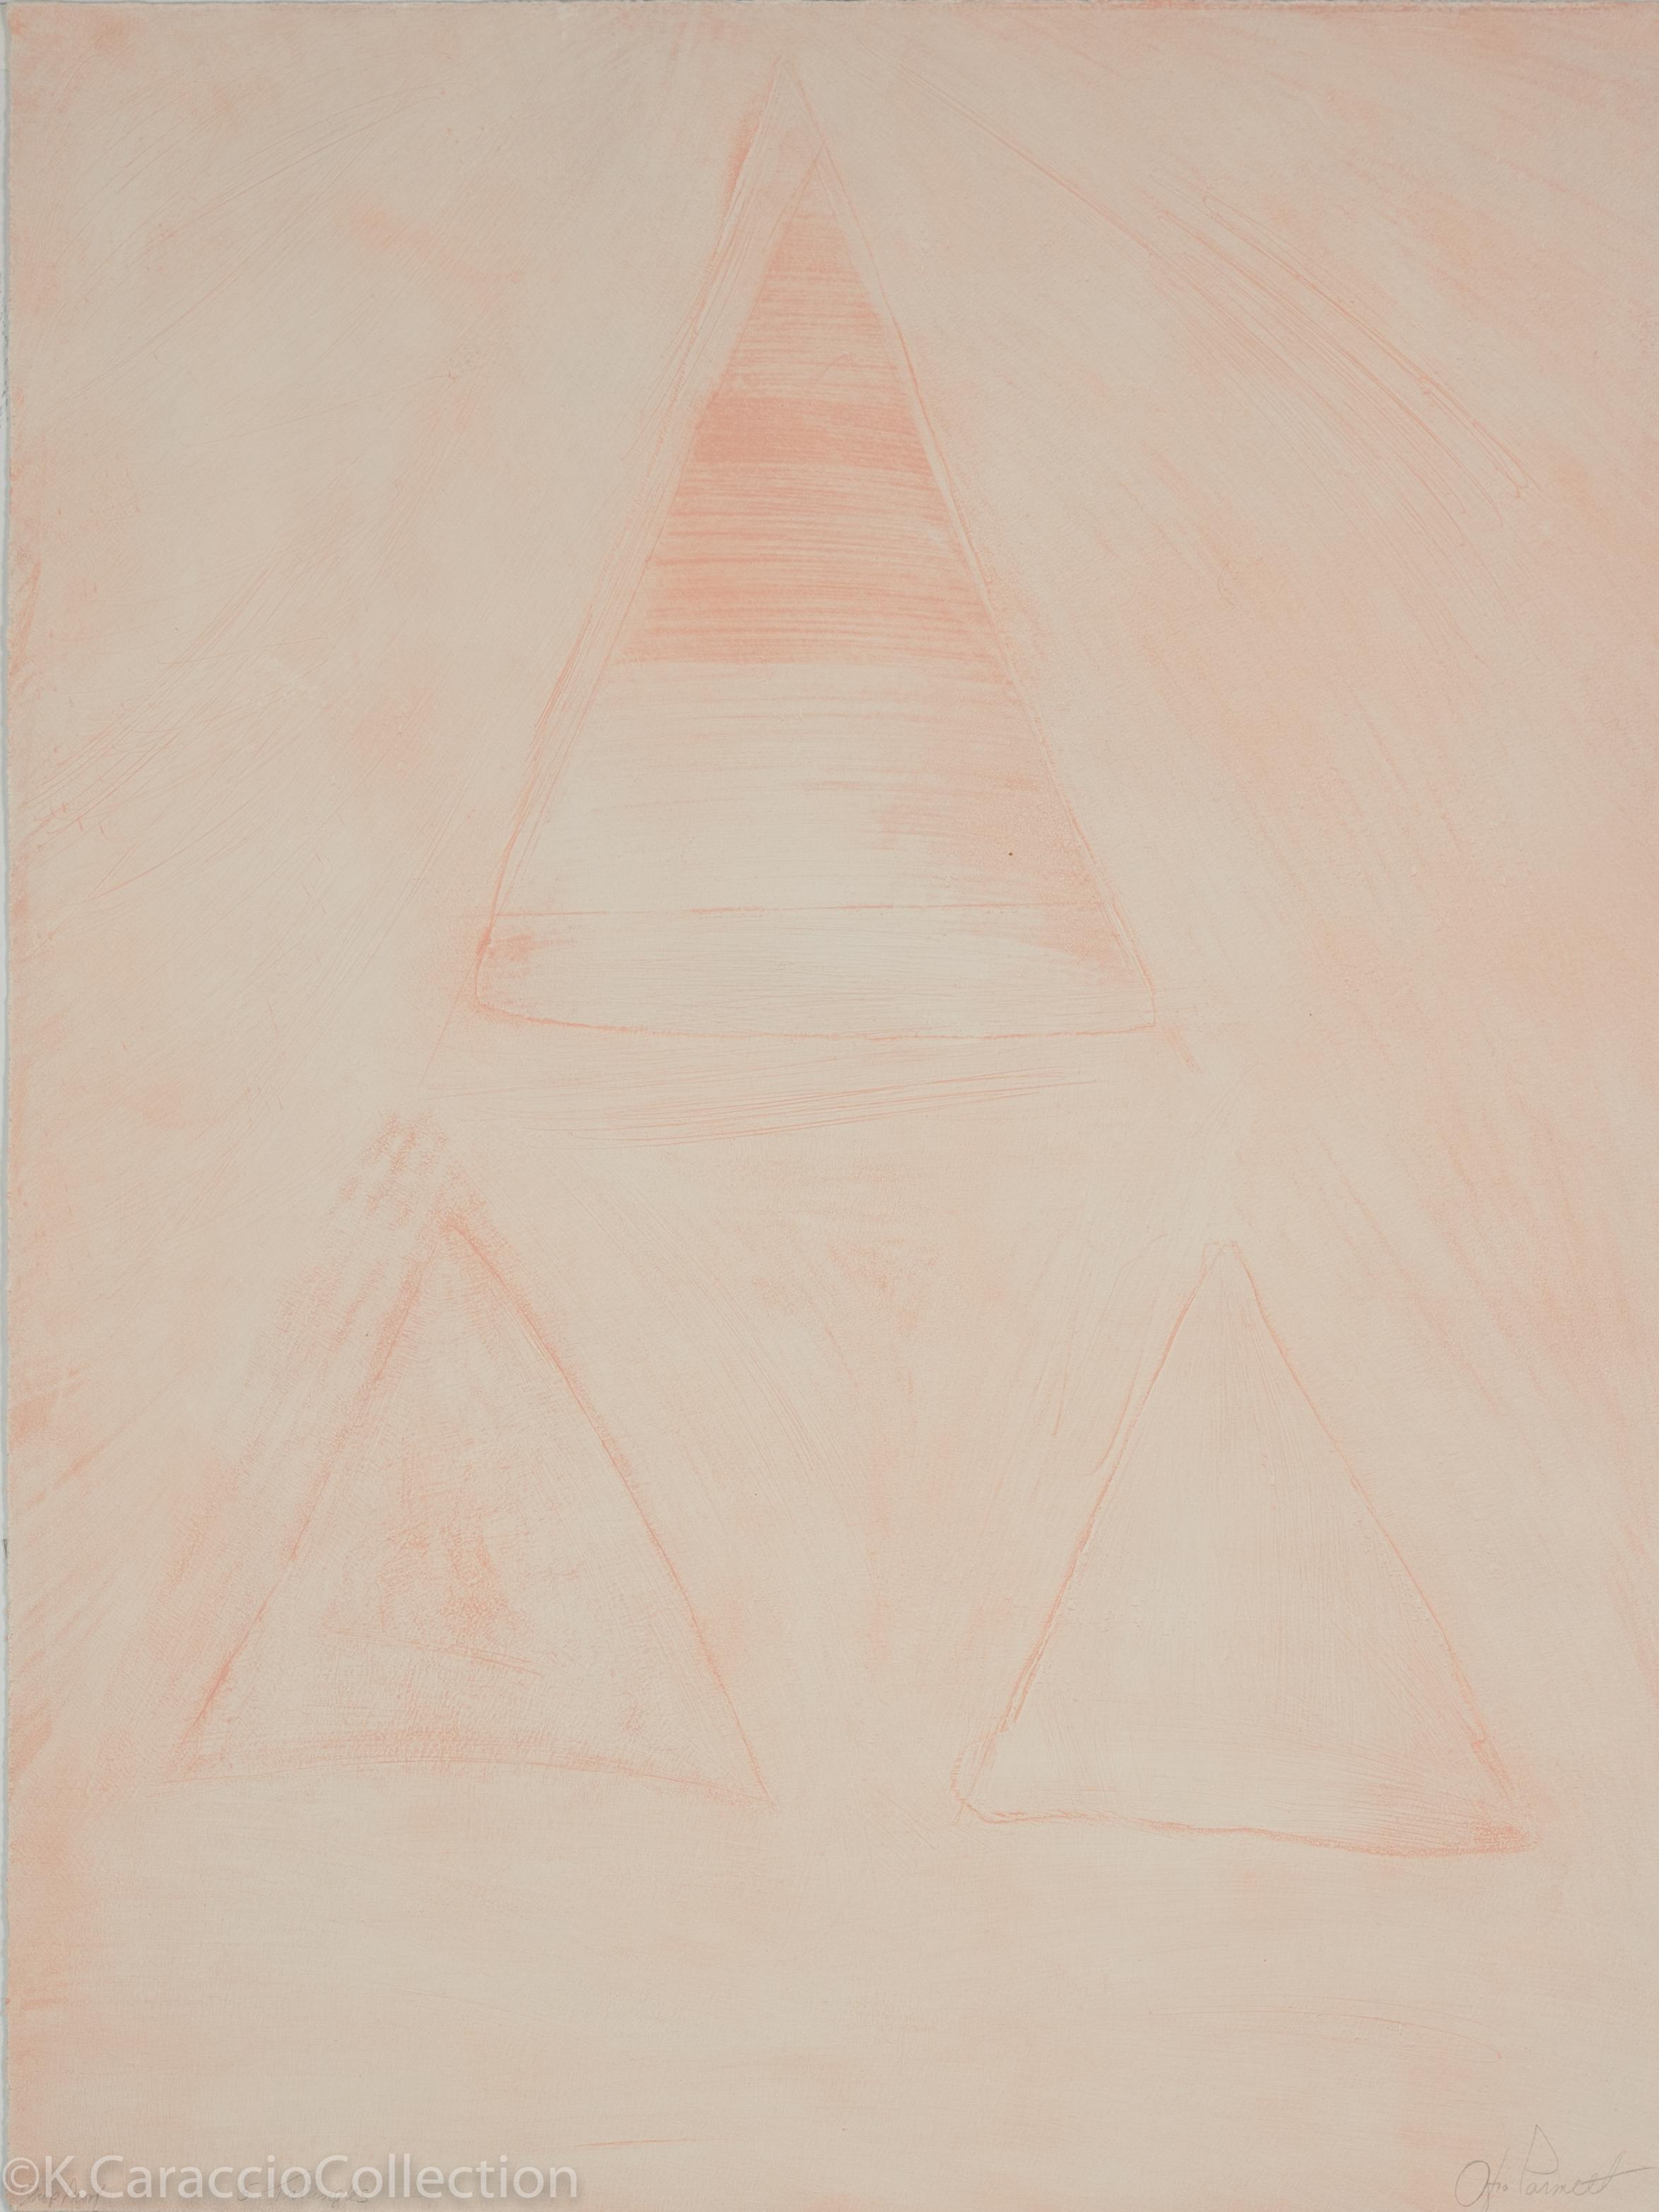 5 Triangles, 1981